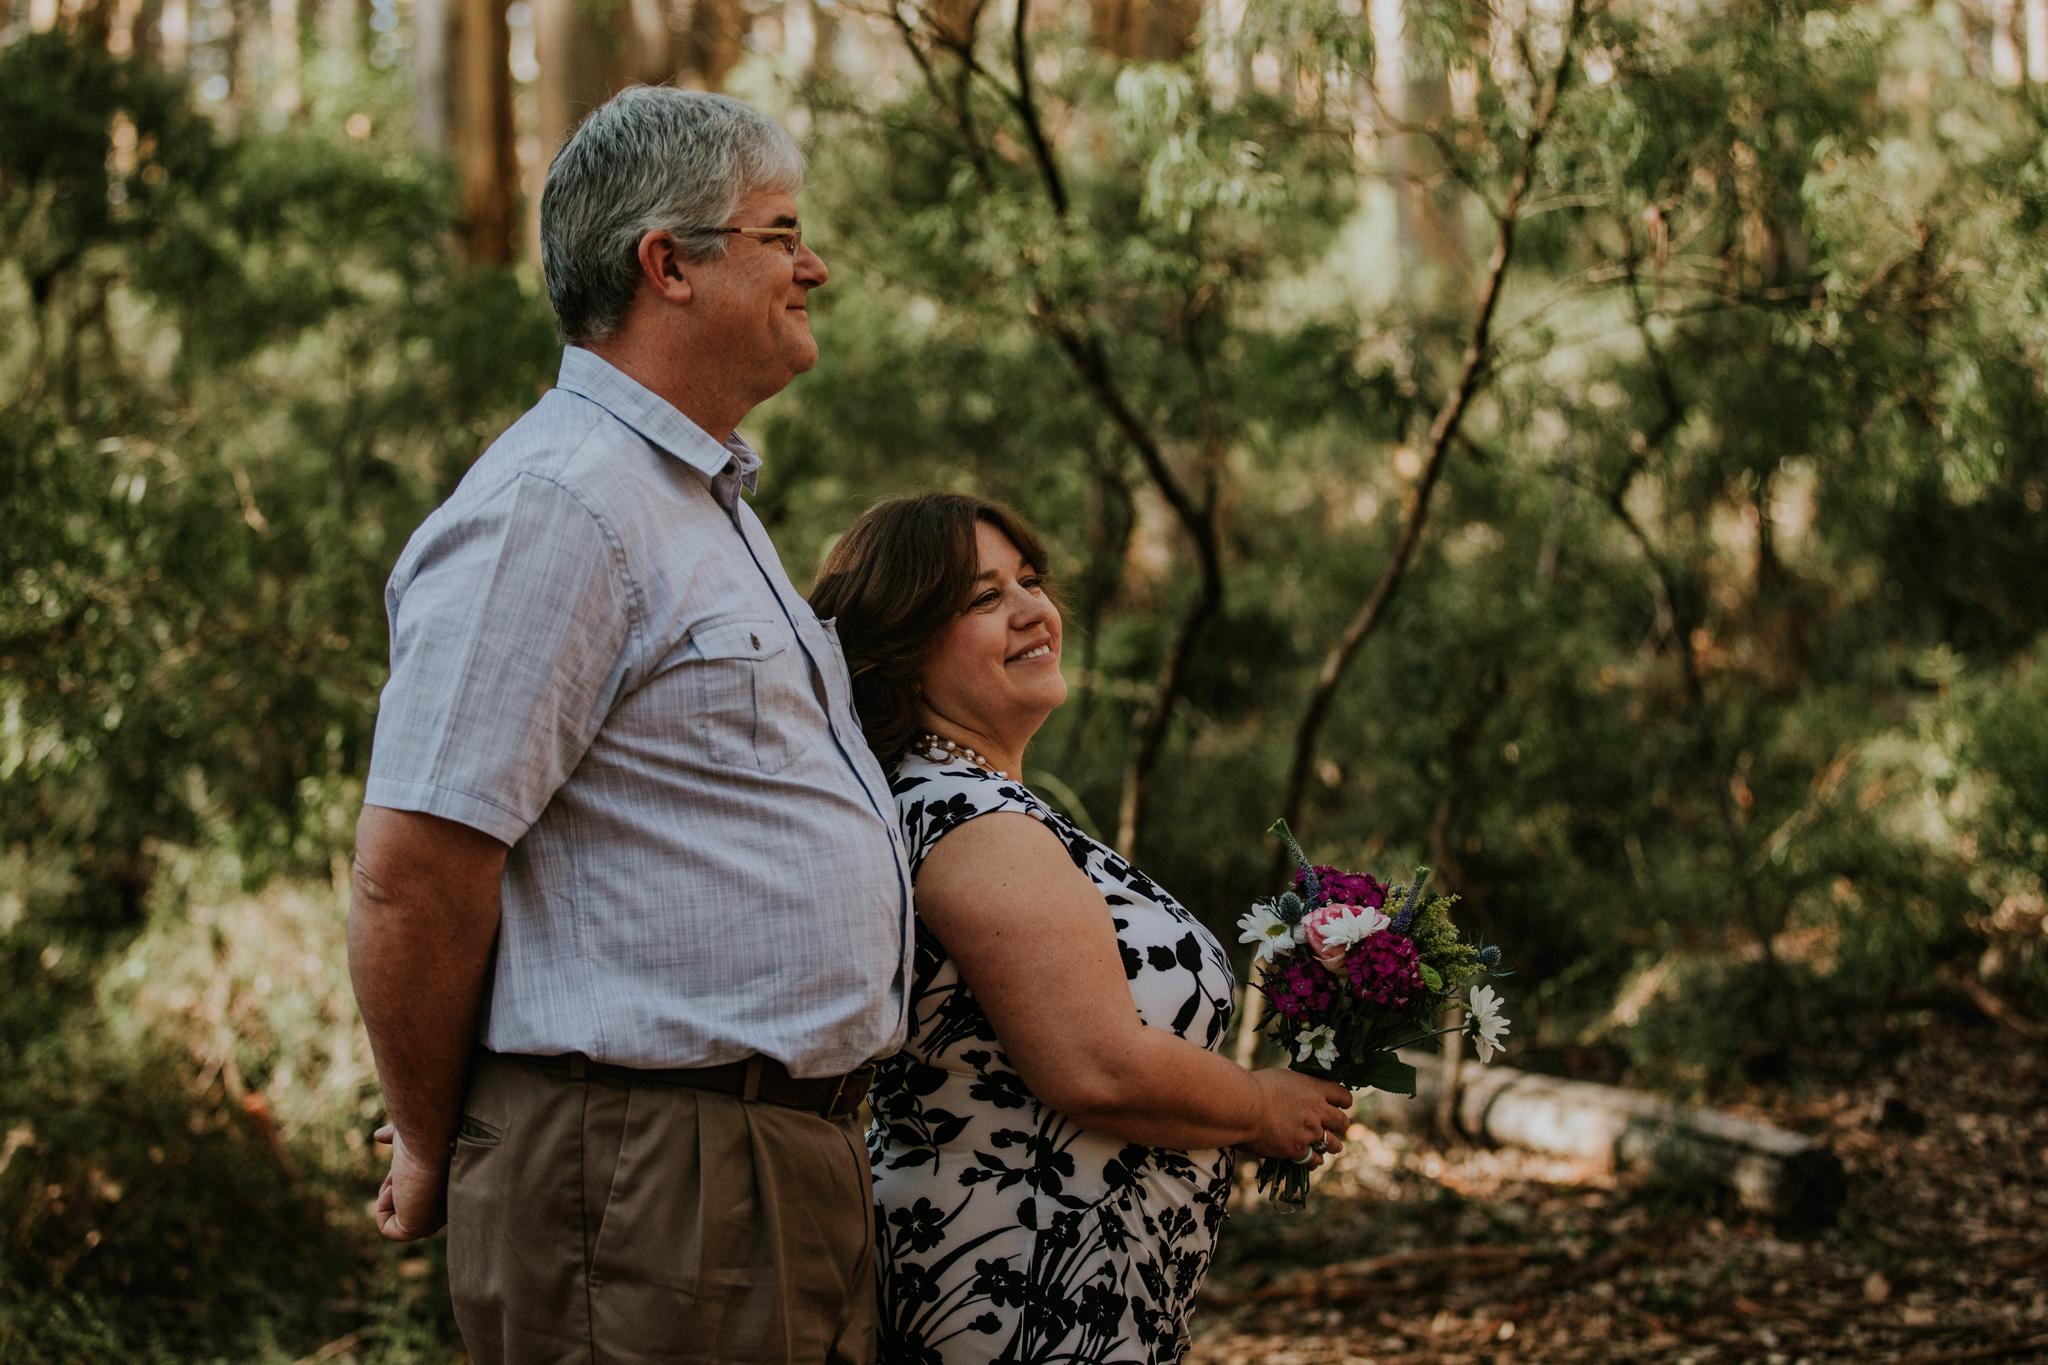 Destination Wedding Photographer - Vow of the Wild